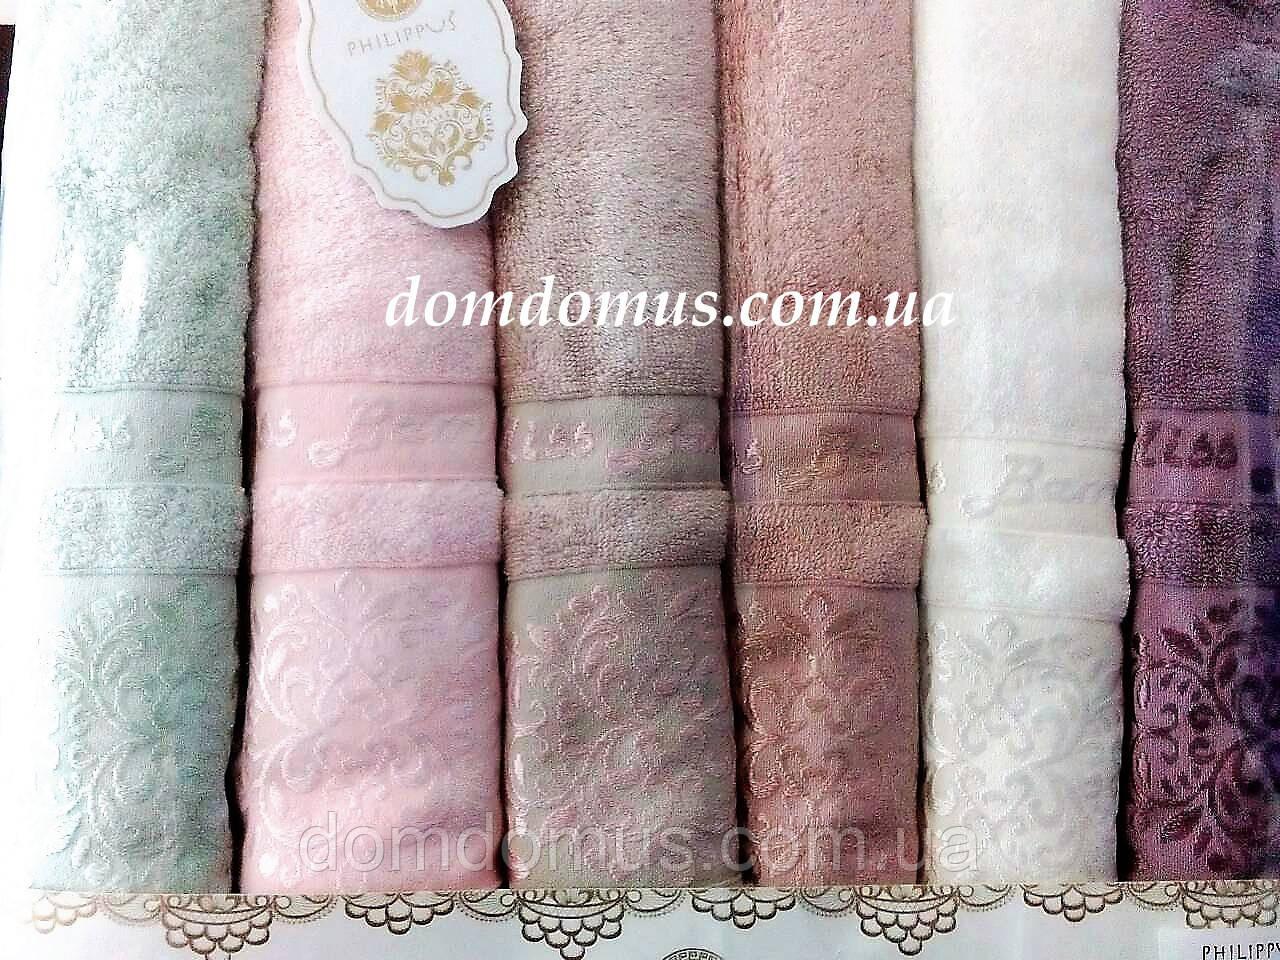 Рушник для обличчя Miss Bamboo 50*90 Philippus (100 % бамбук) 6 шт./уп.,Туреччина 867